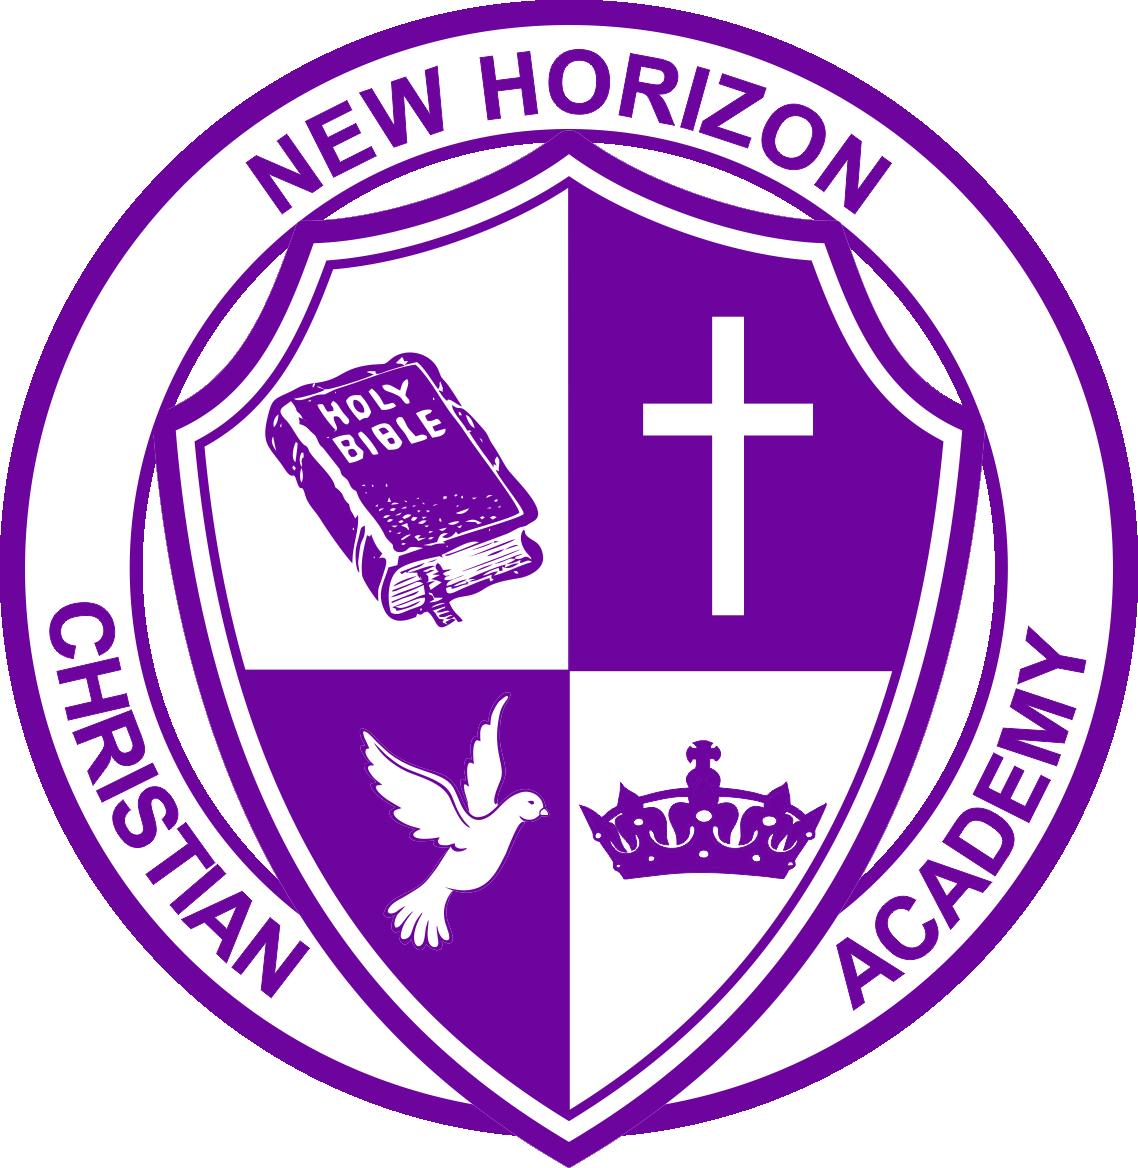 New Horizon Christian Academy